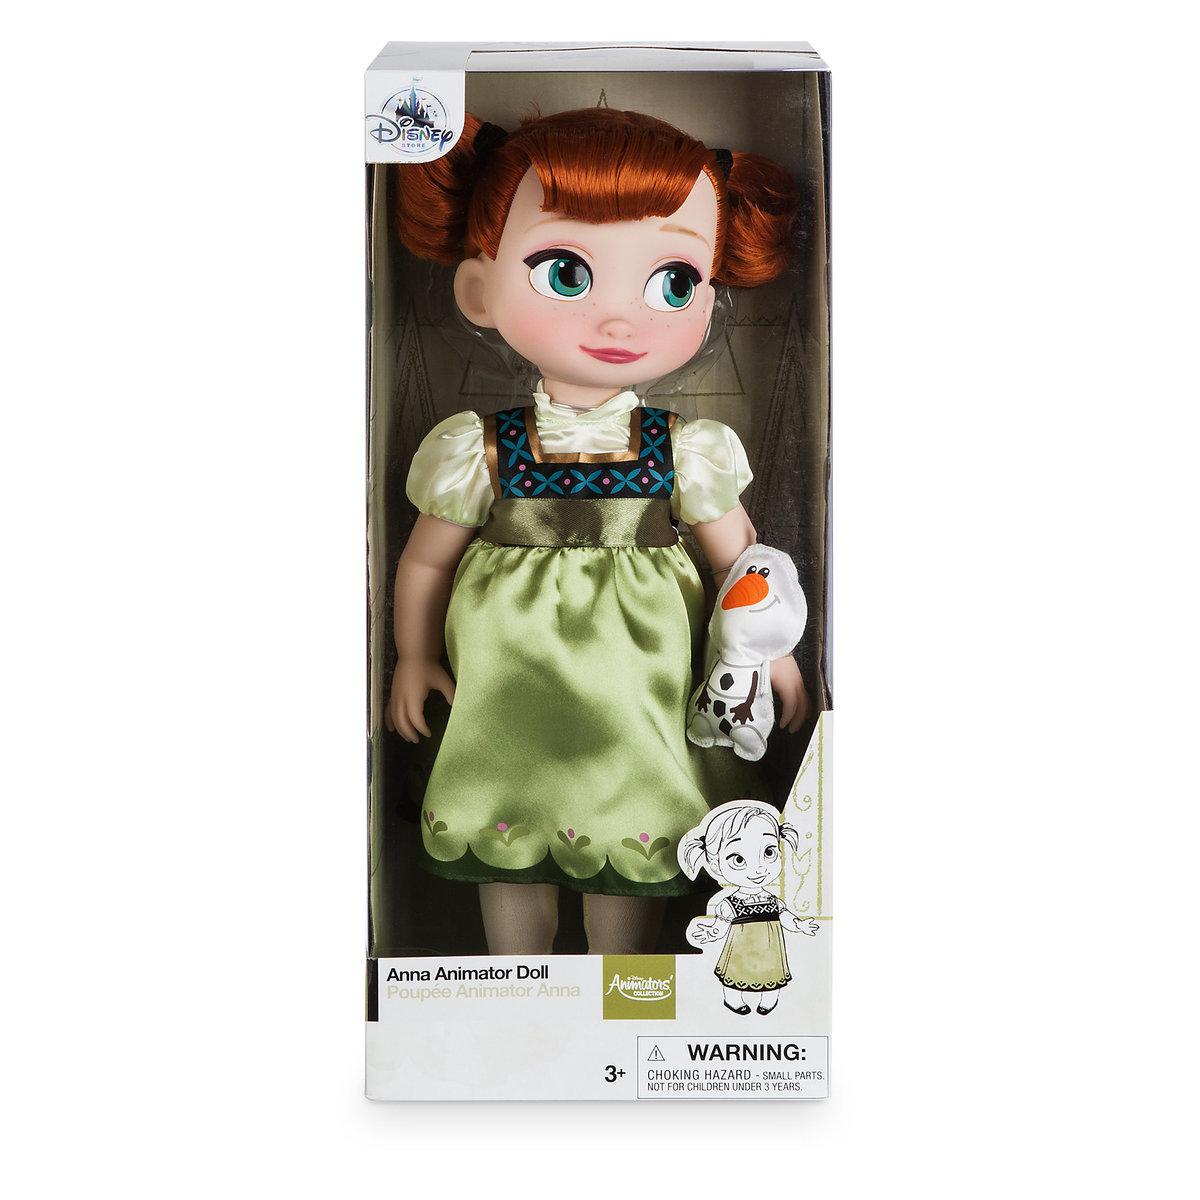 Disney Animators' Collection Anna Doll - Frozen - 16'' ของแท้ นำเข้าจากอเมริกา